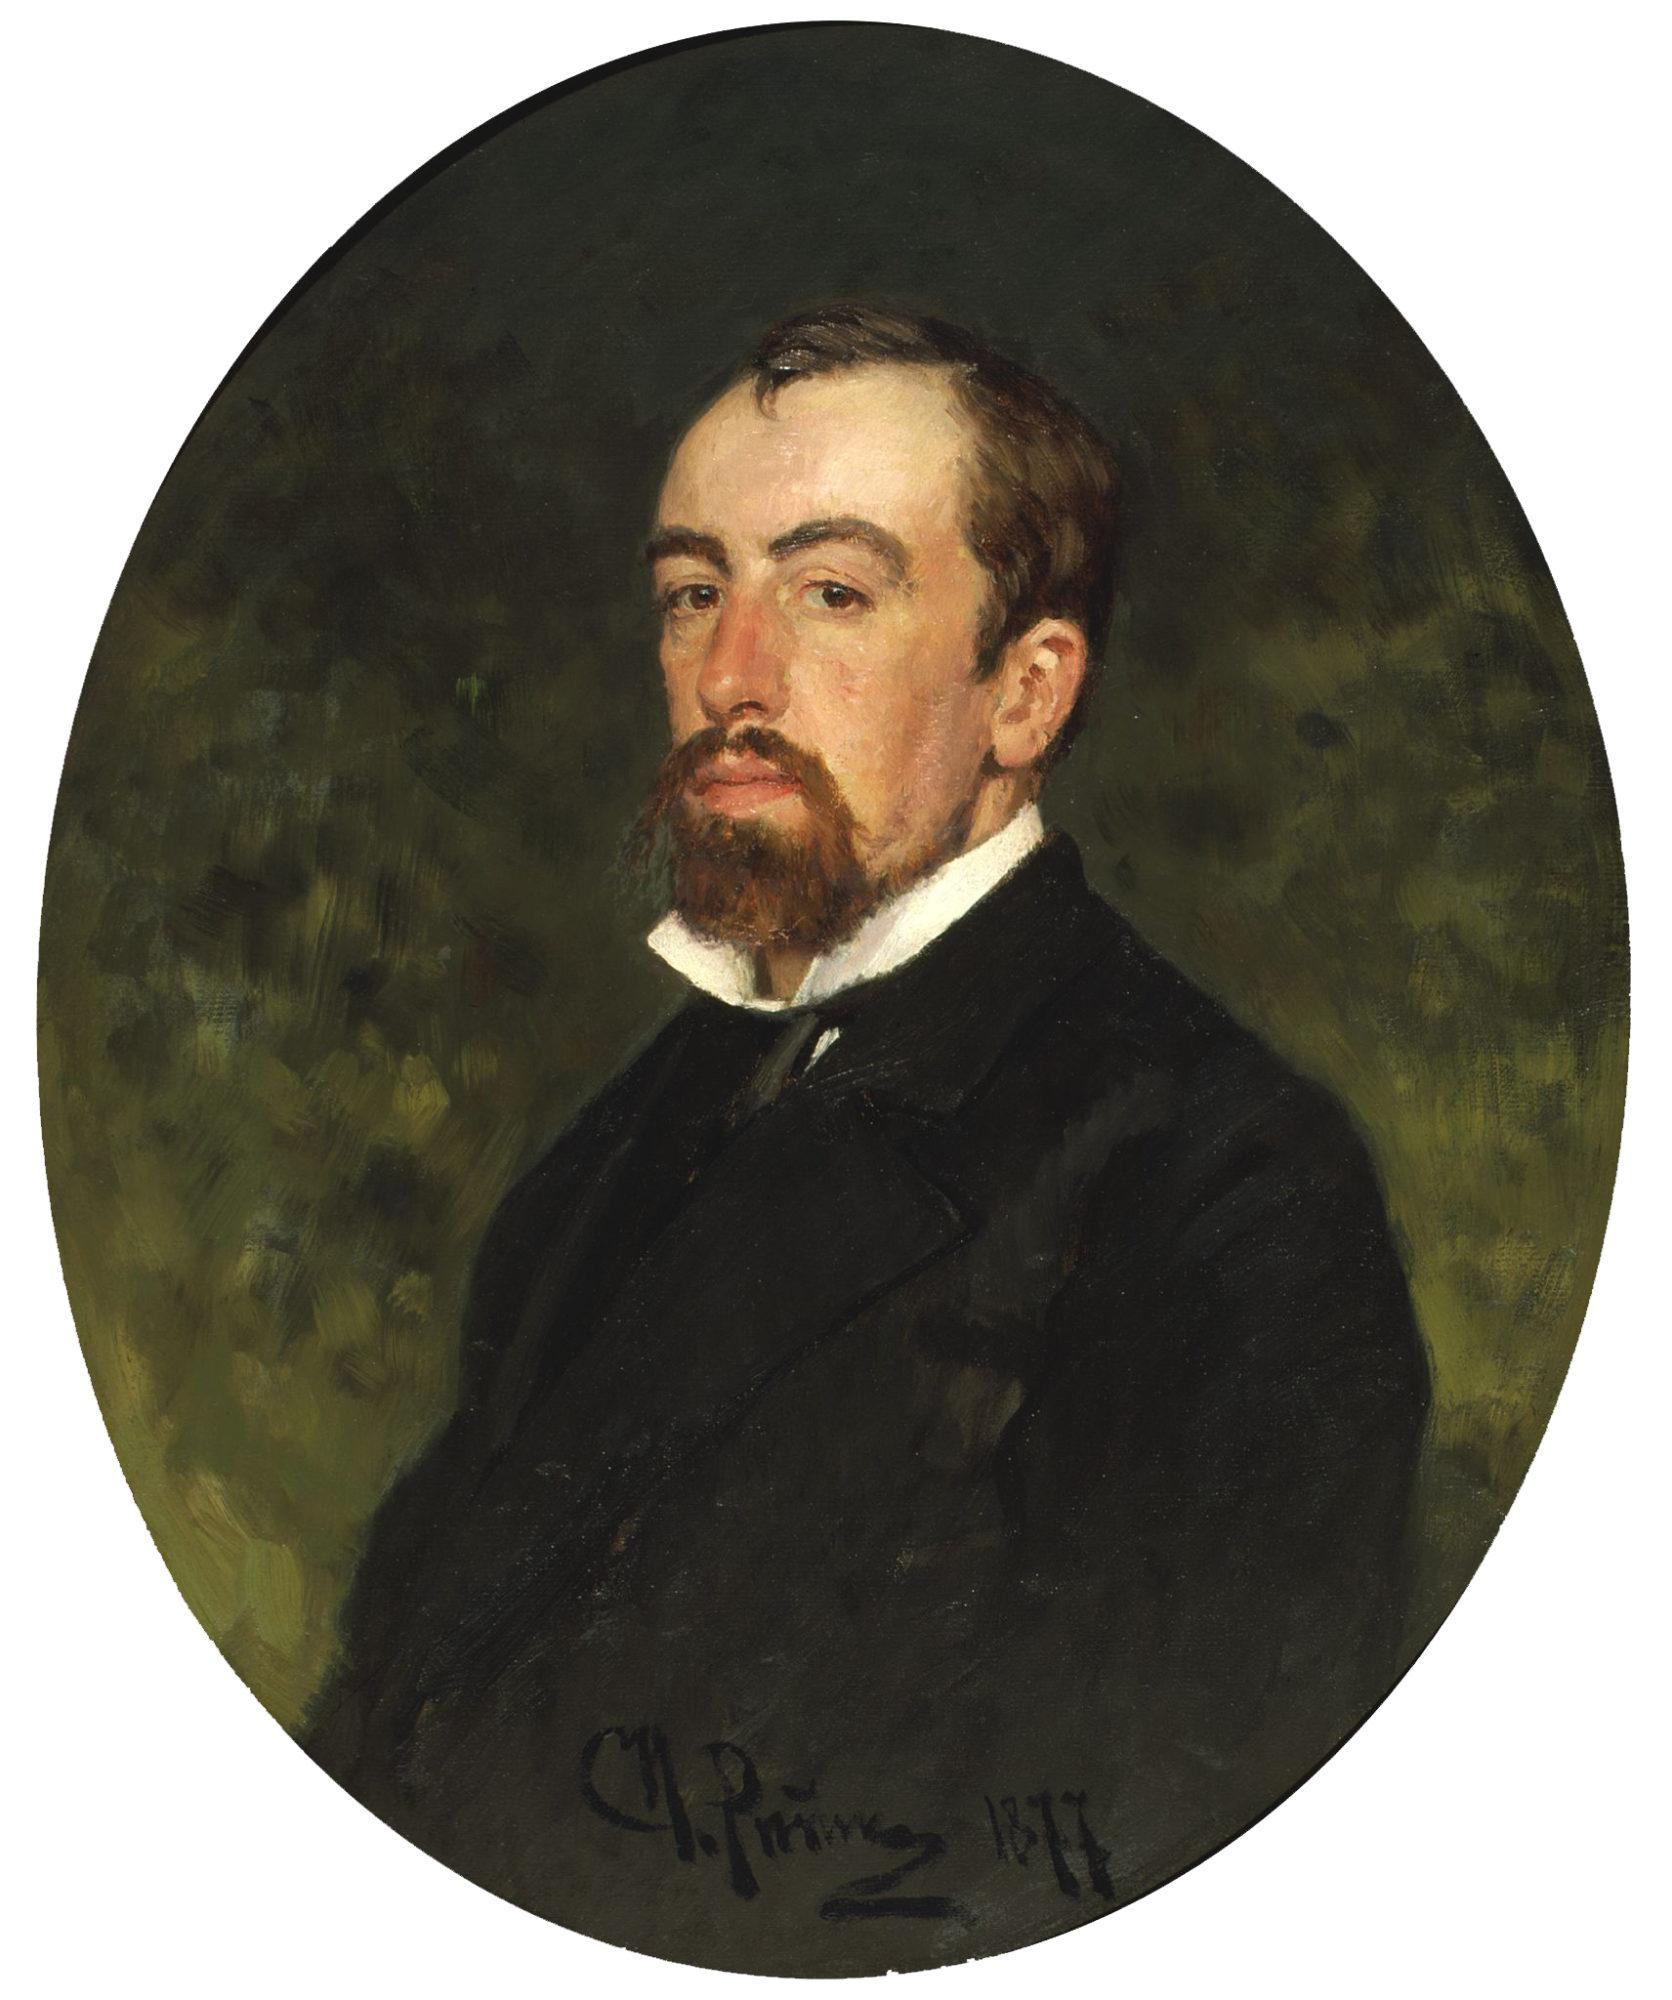 Портрет Василия Поленова кисти Репина, 1877 год.